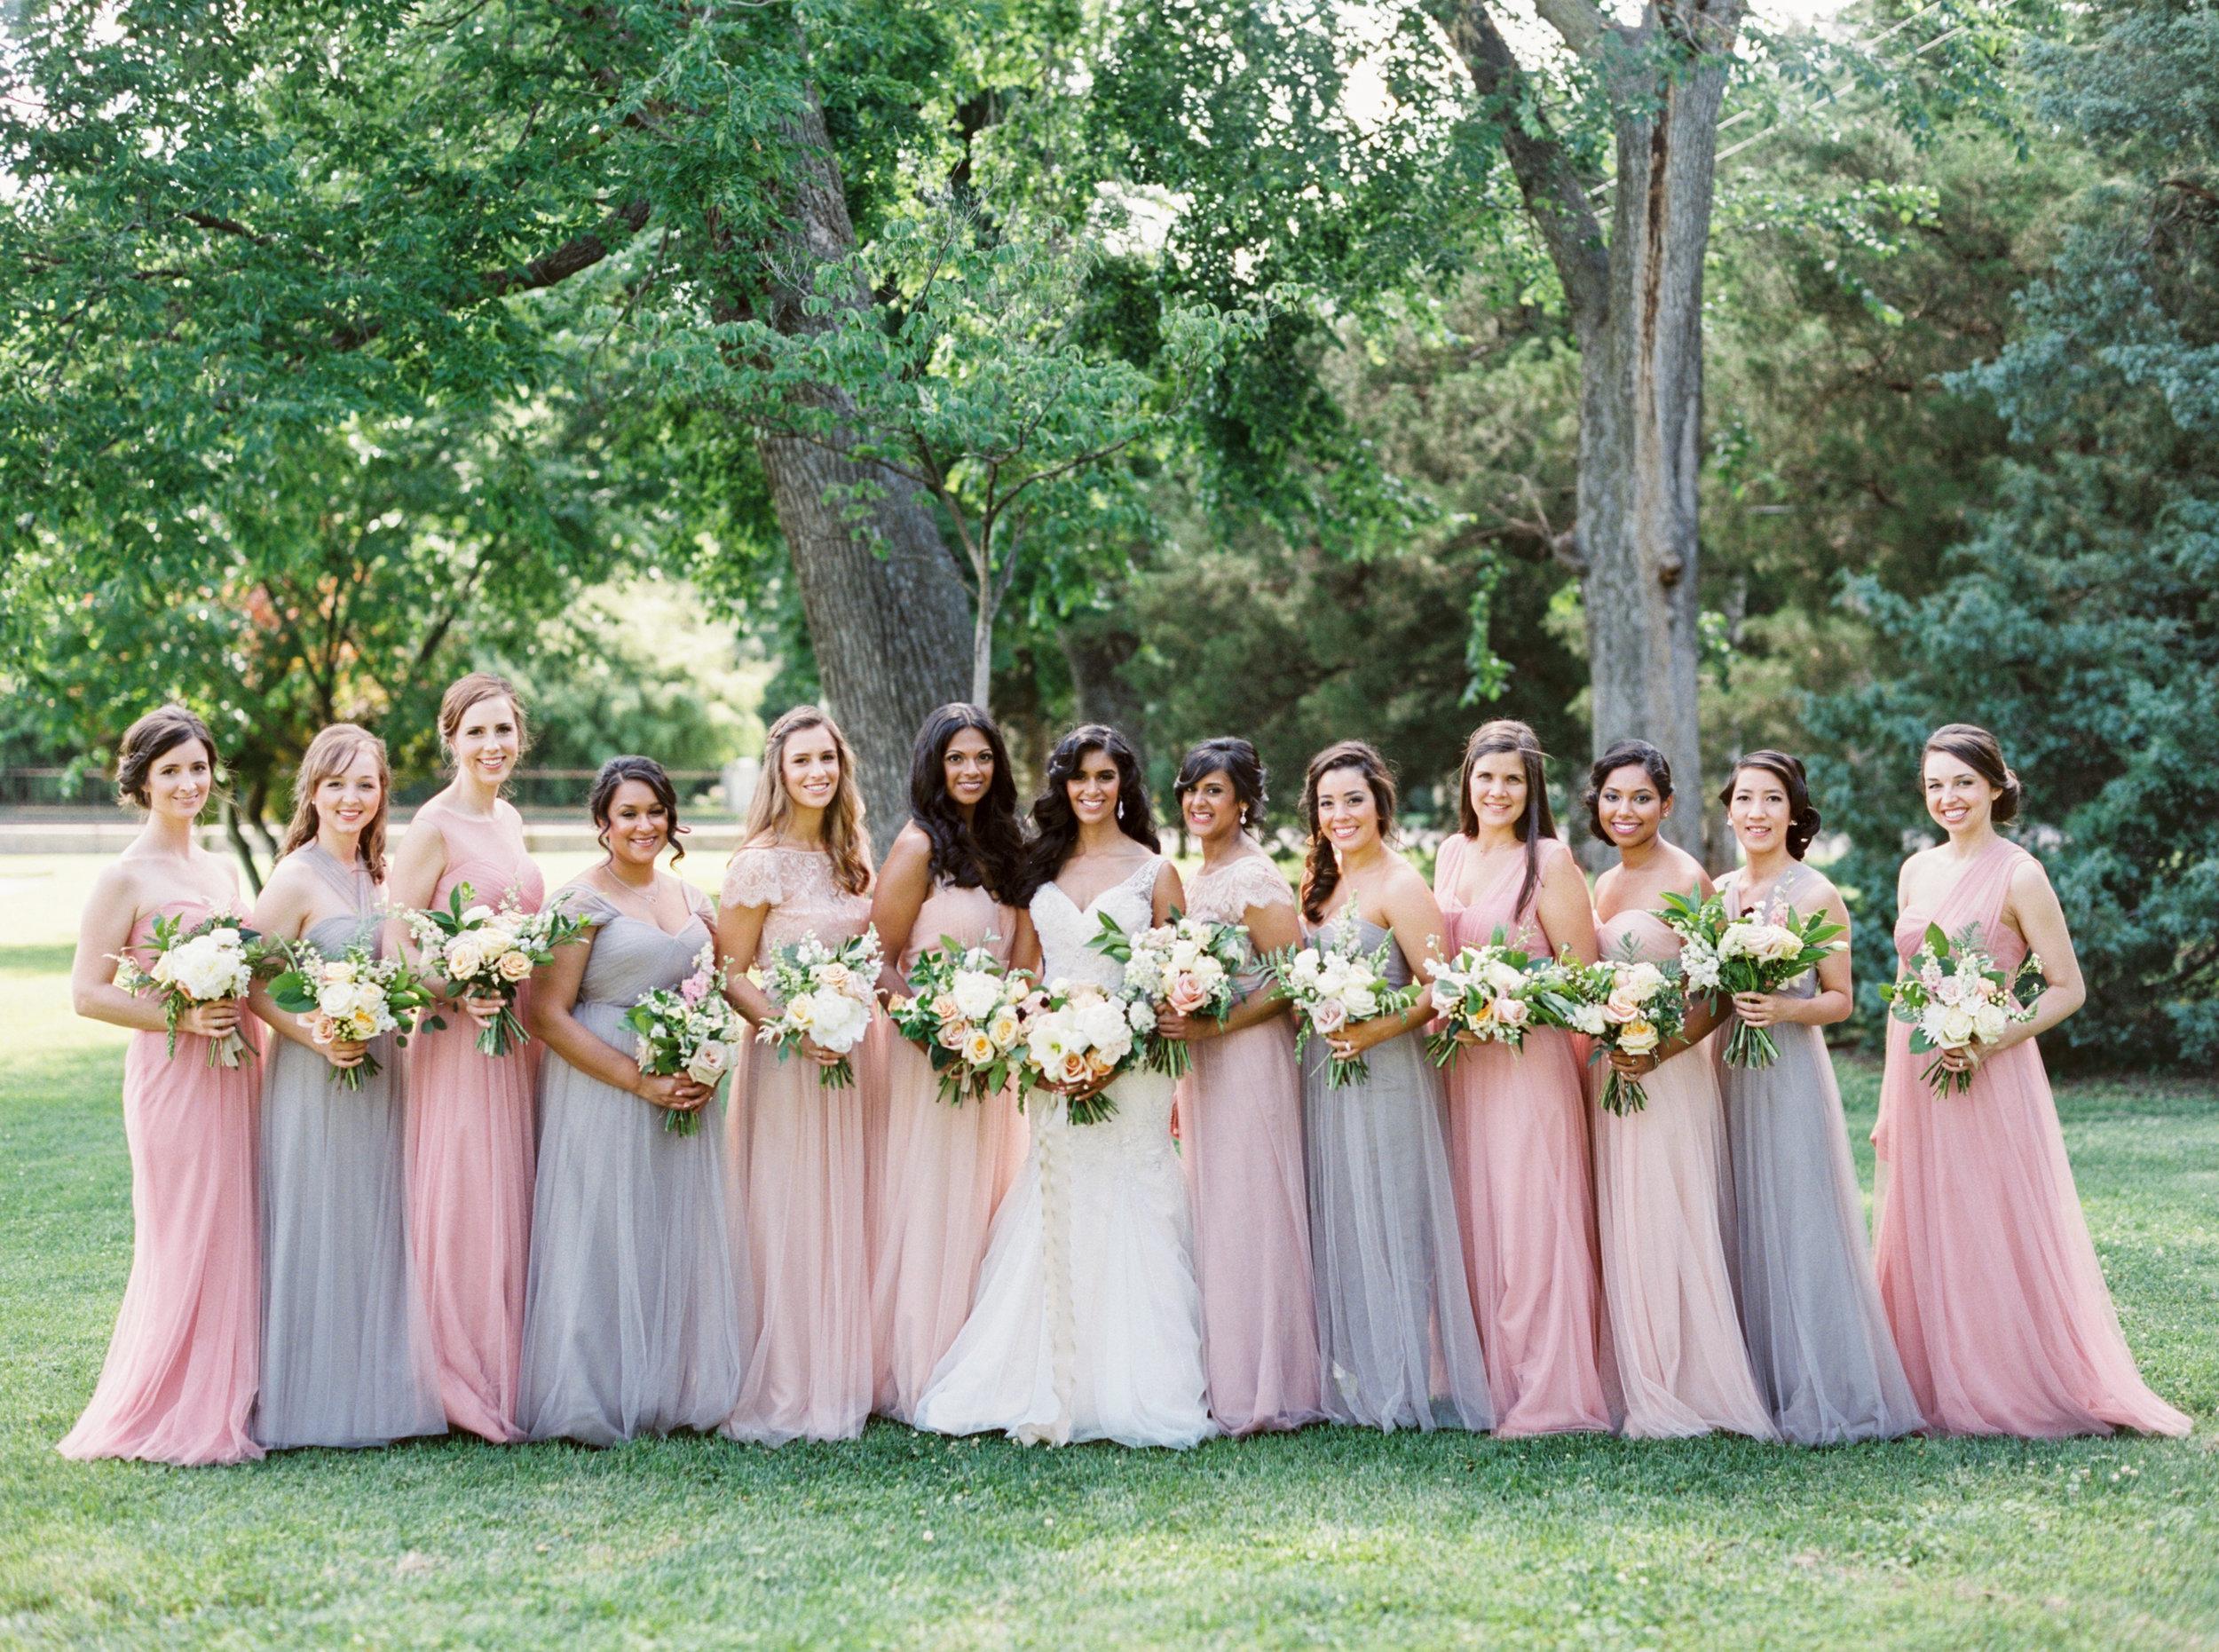 Pastel bridesmaids - Tulsa Garden Center Wedding - eversomething.com